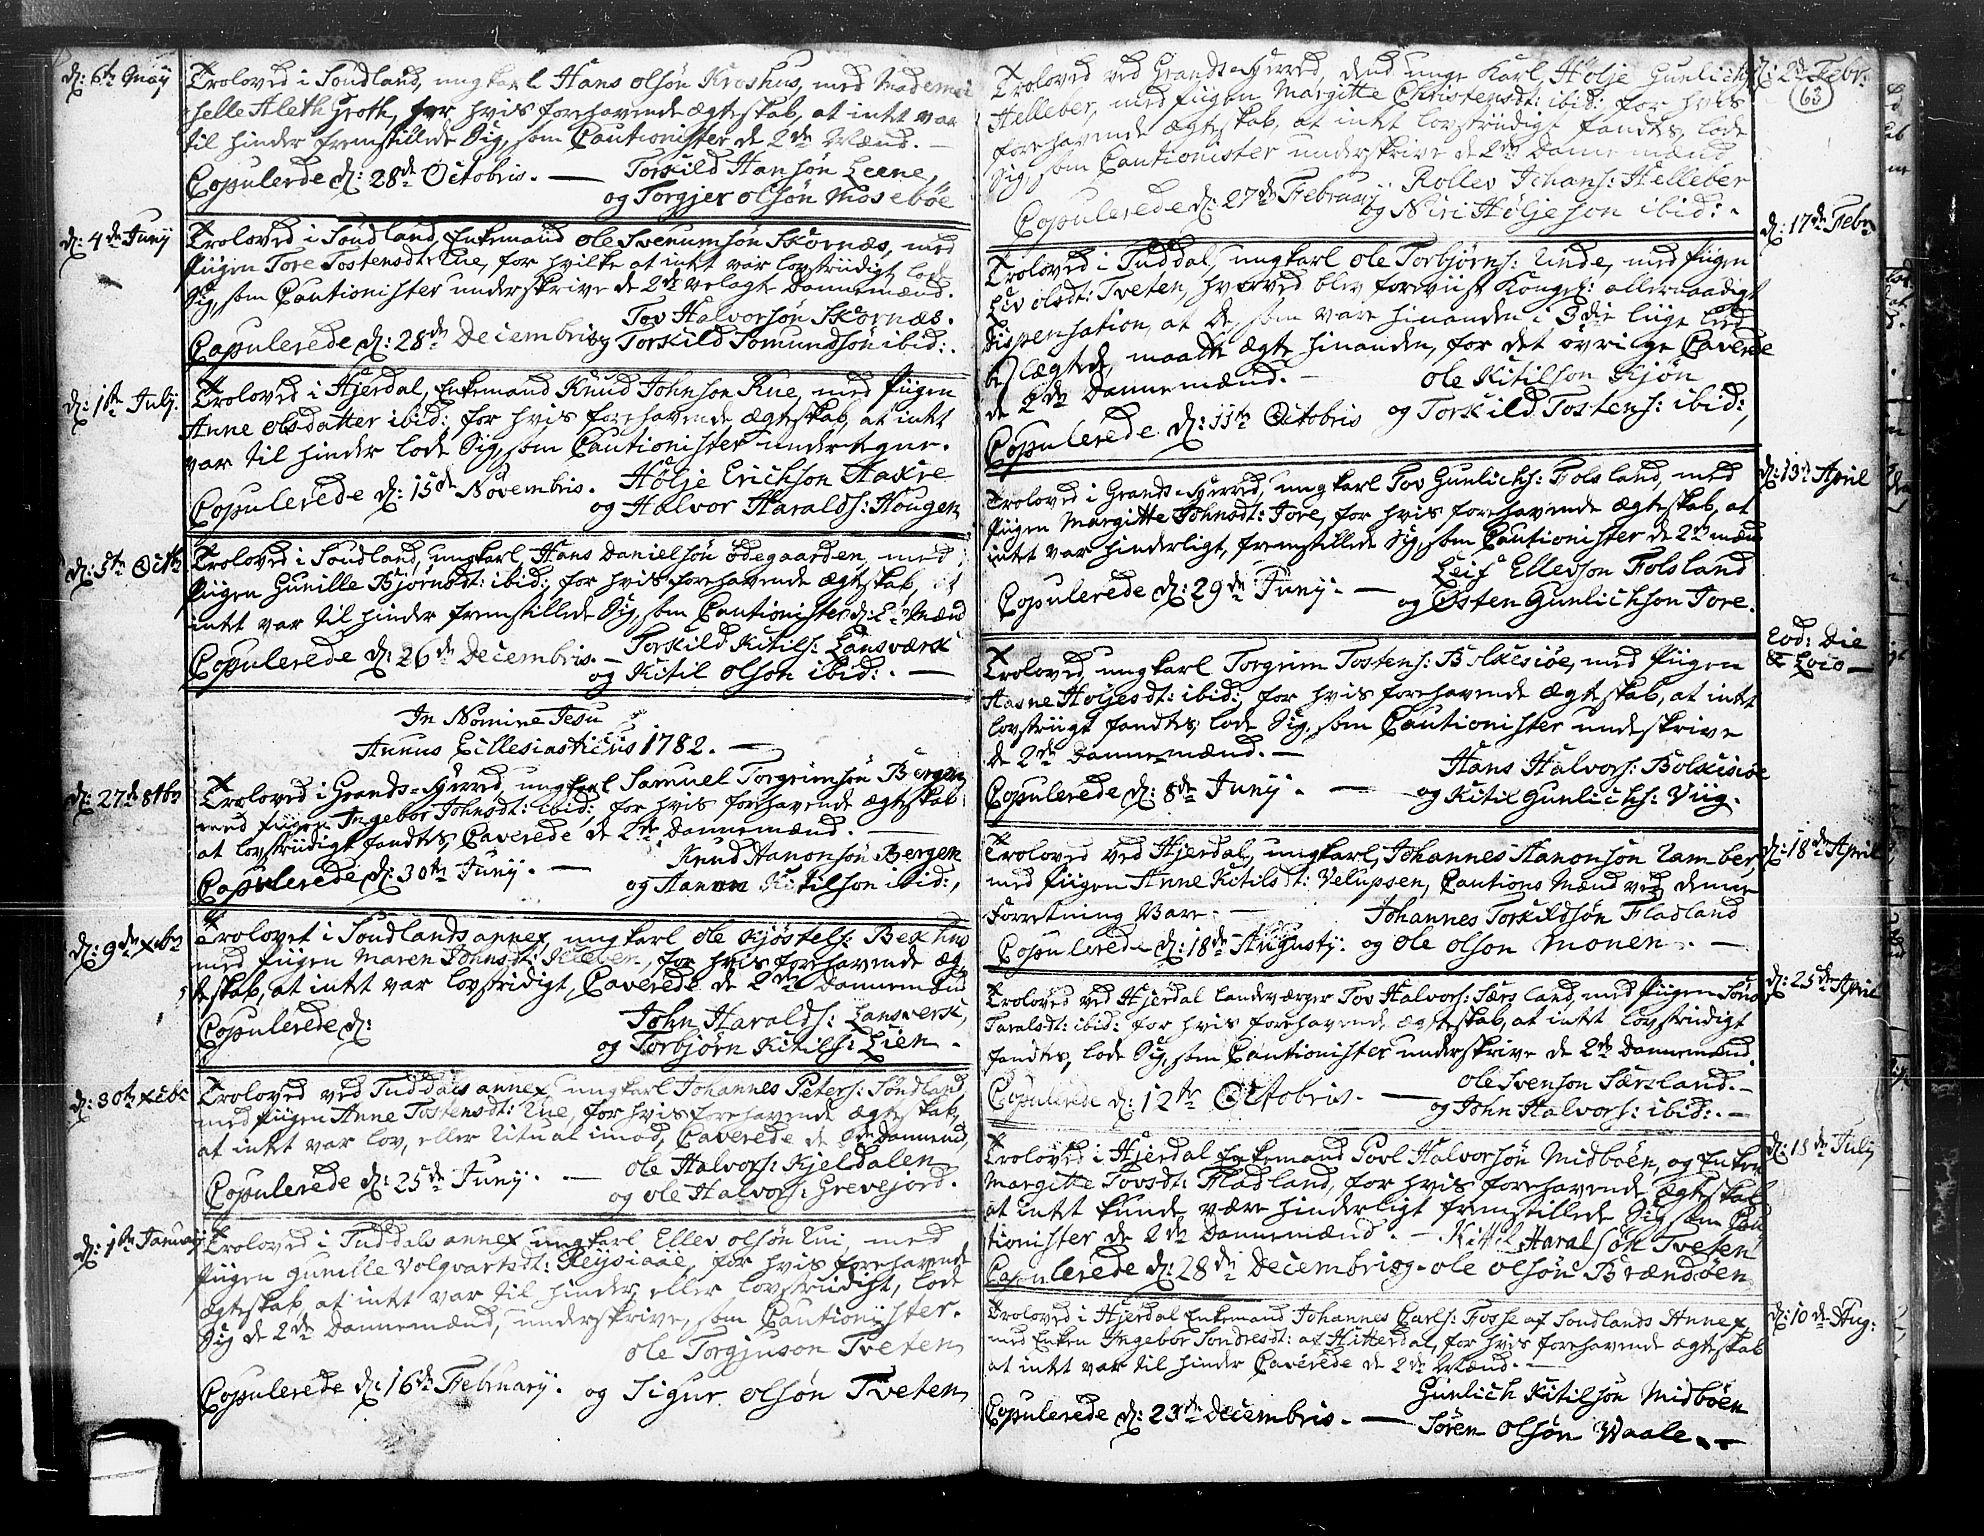 SAKO, Hjartdal kirkebøker, F/Fa/L0004: Ministerialbok nr. I 4, 1727-1795, s. 63